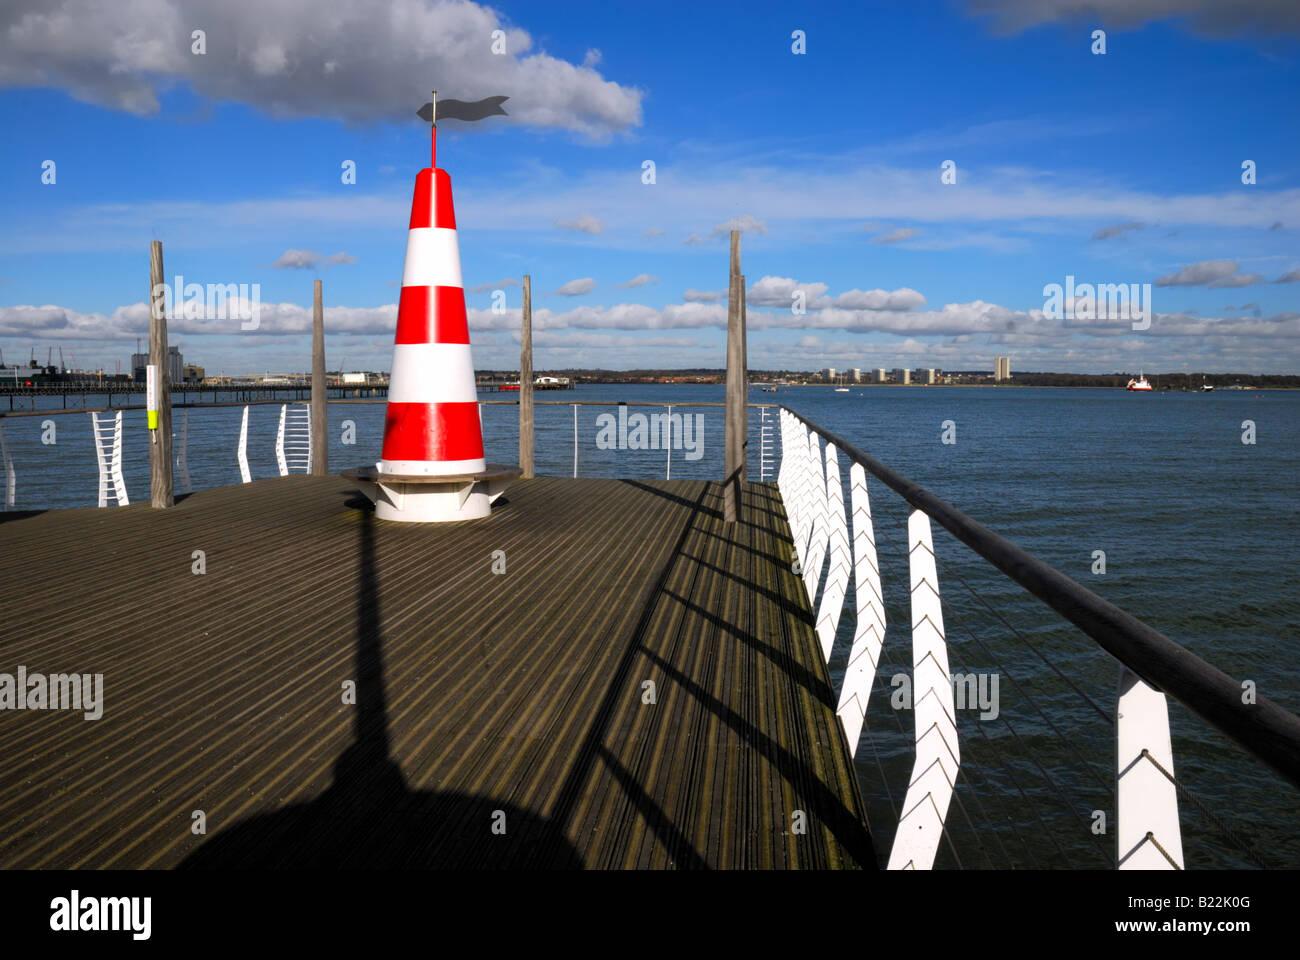 Jetty at Hythe Southampton Water Hampshire England UK - Stock Image